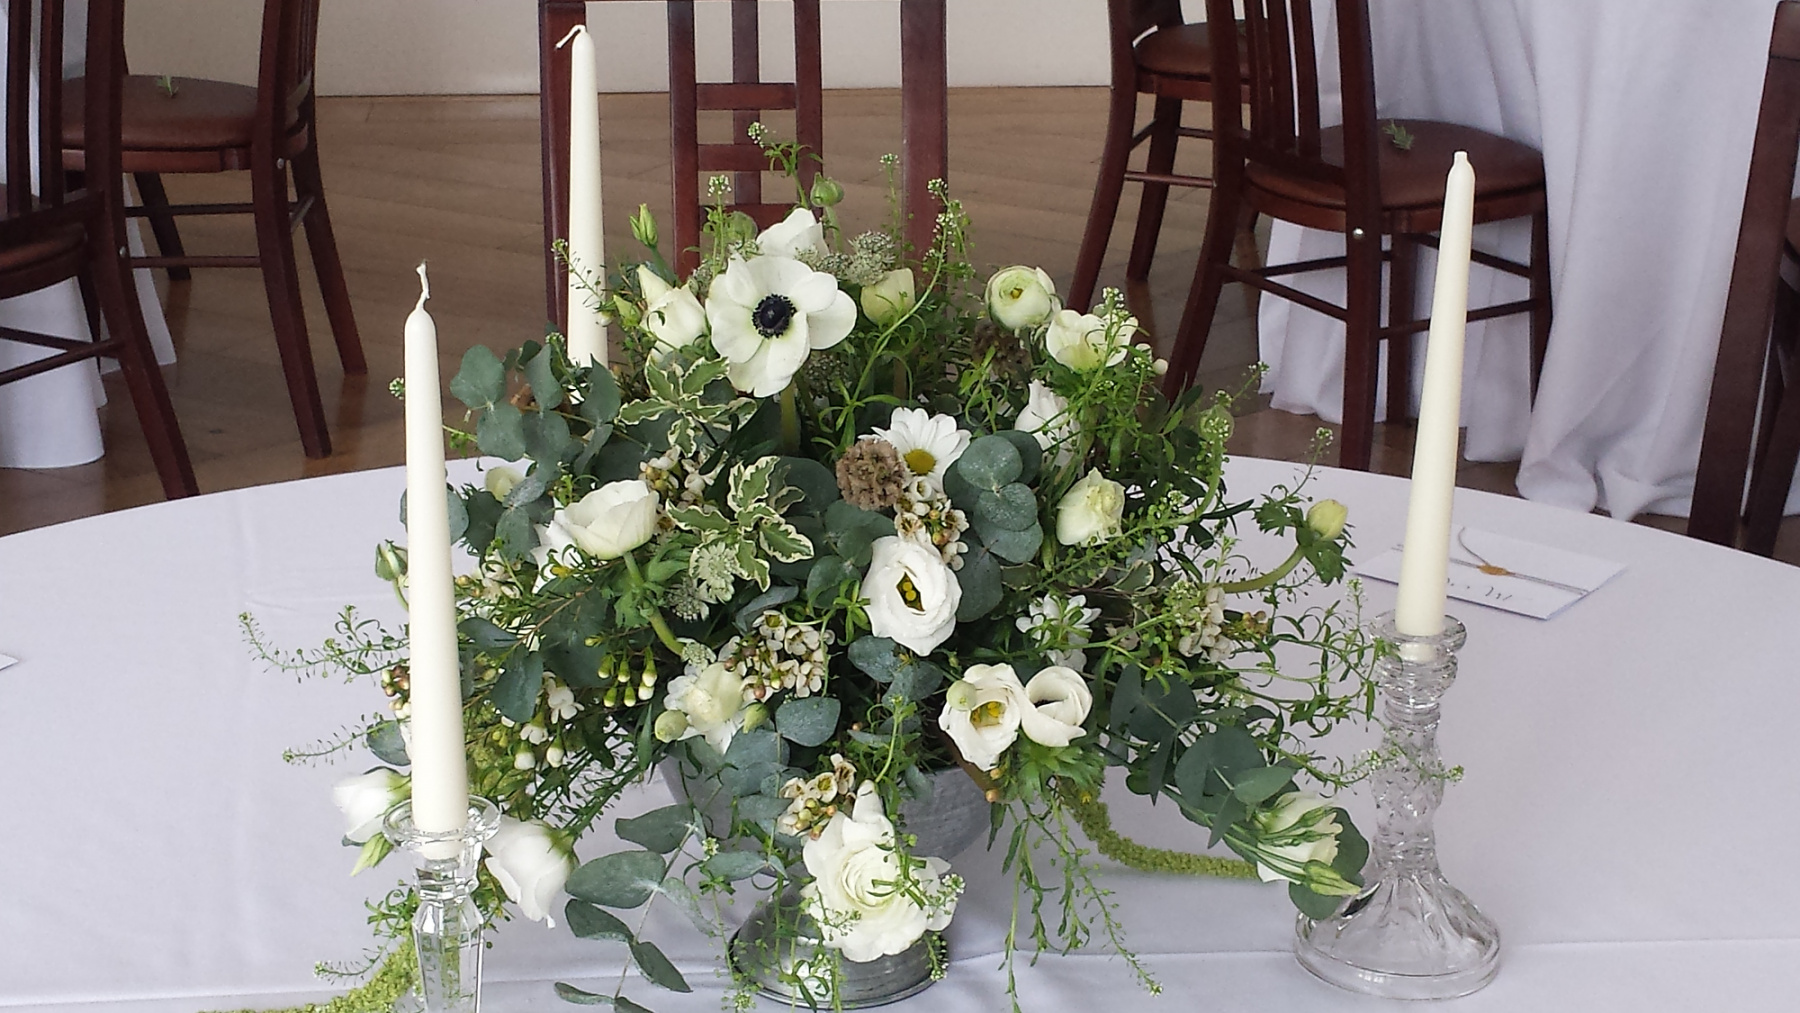 pendrell-hall-wedding-flowers-rugeley-florist-staffordshire-002